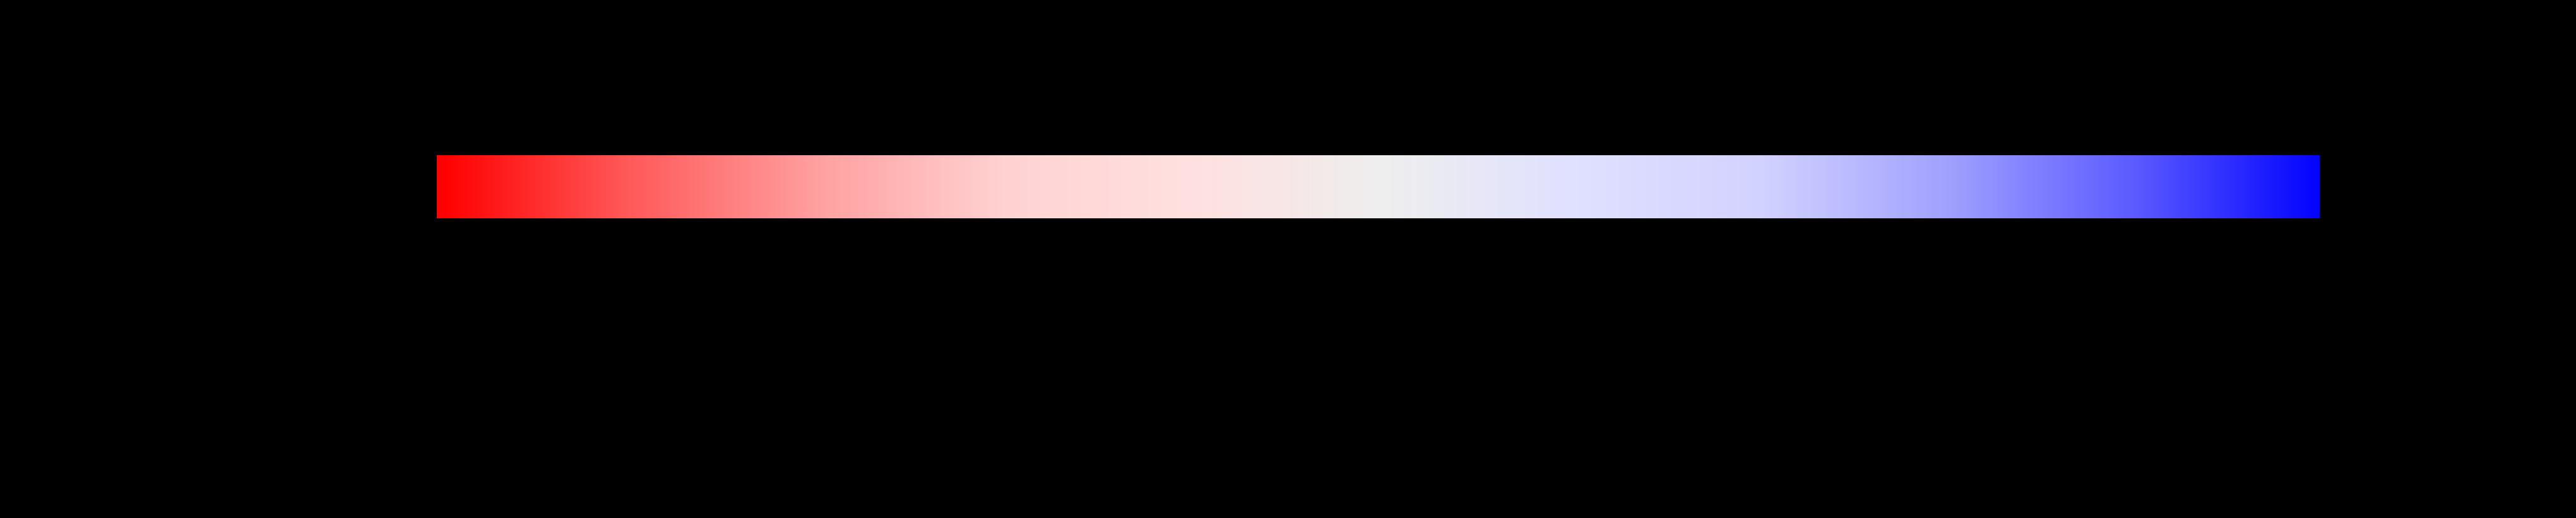 RCSB PDB - 6GH0: Two-quartet kit* G-quadruplex is formed via